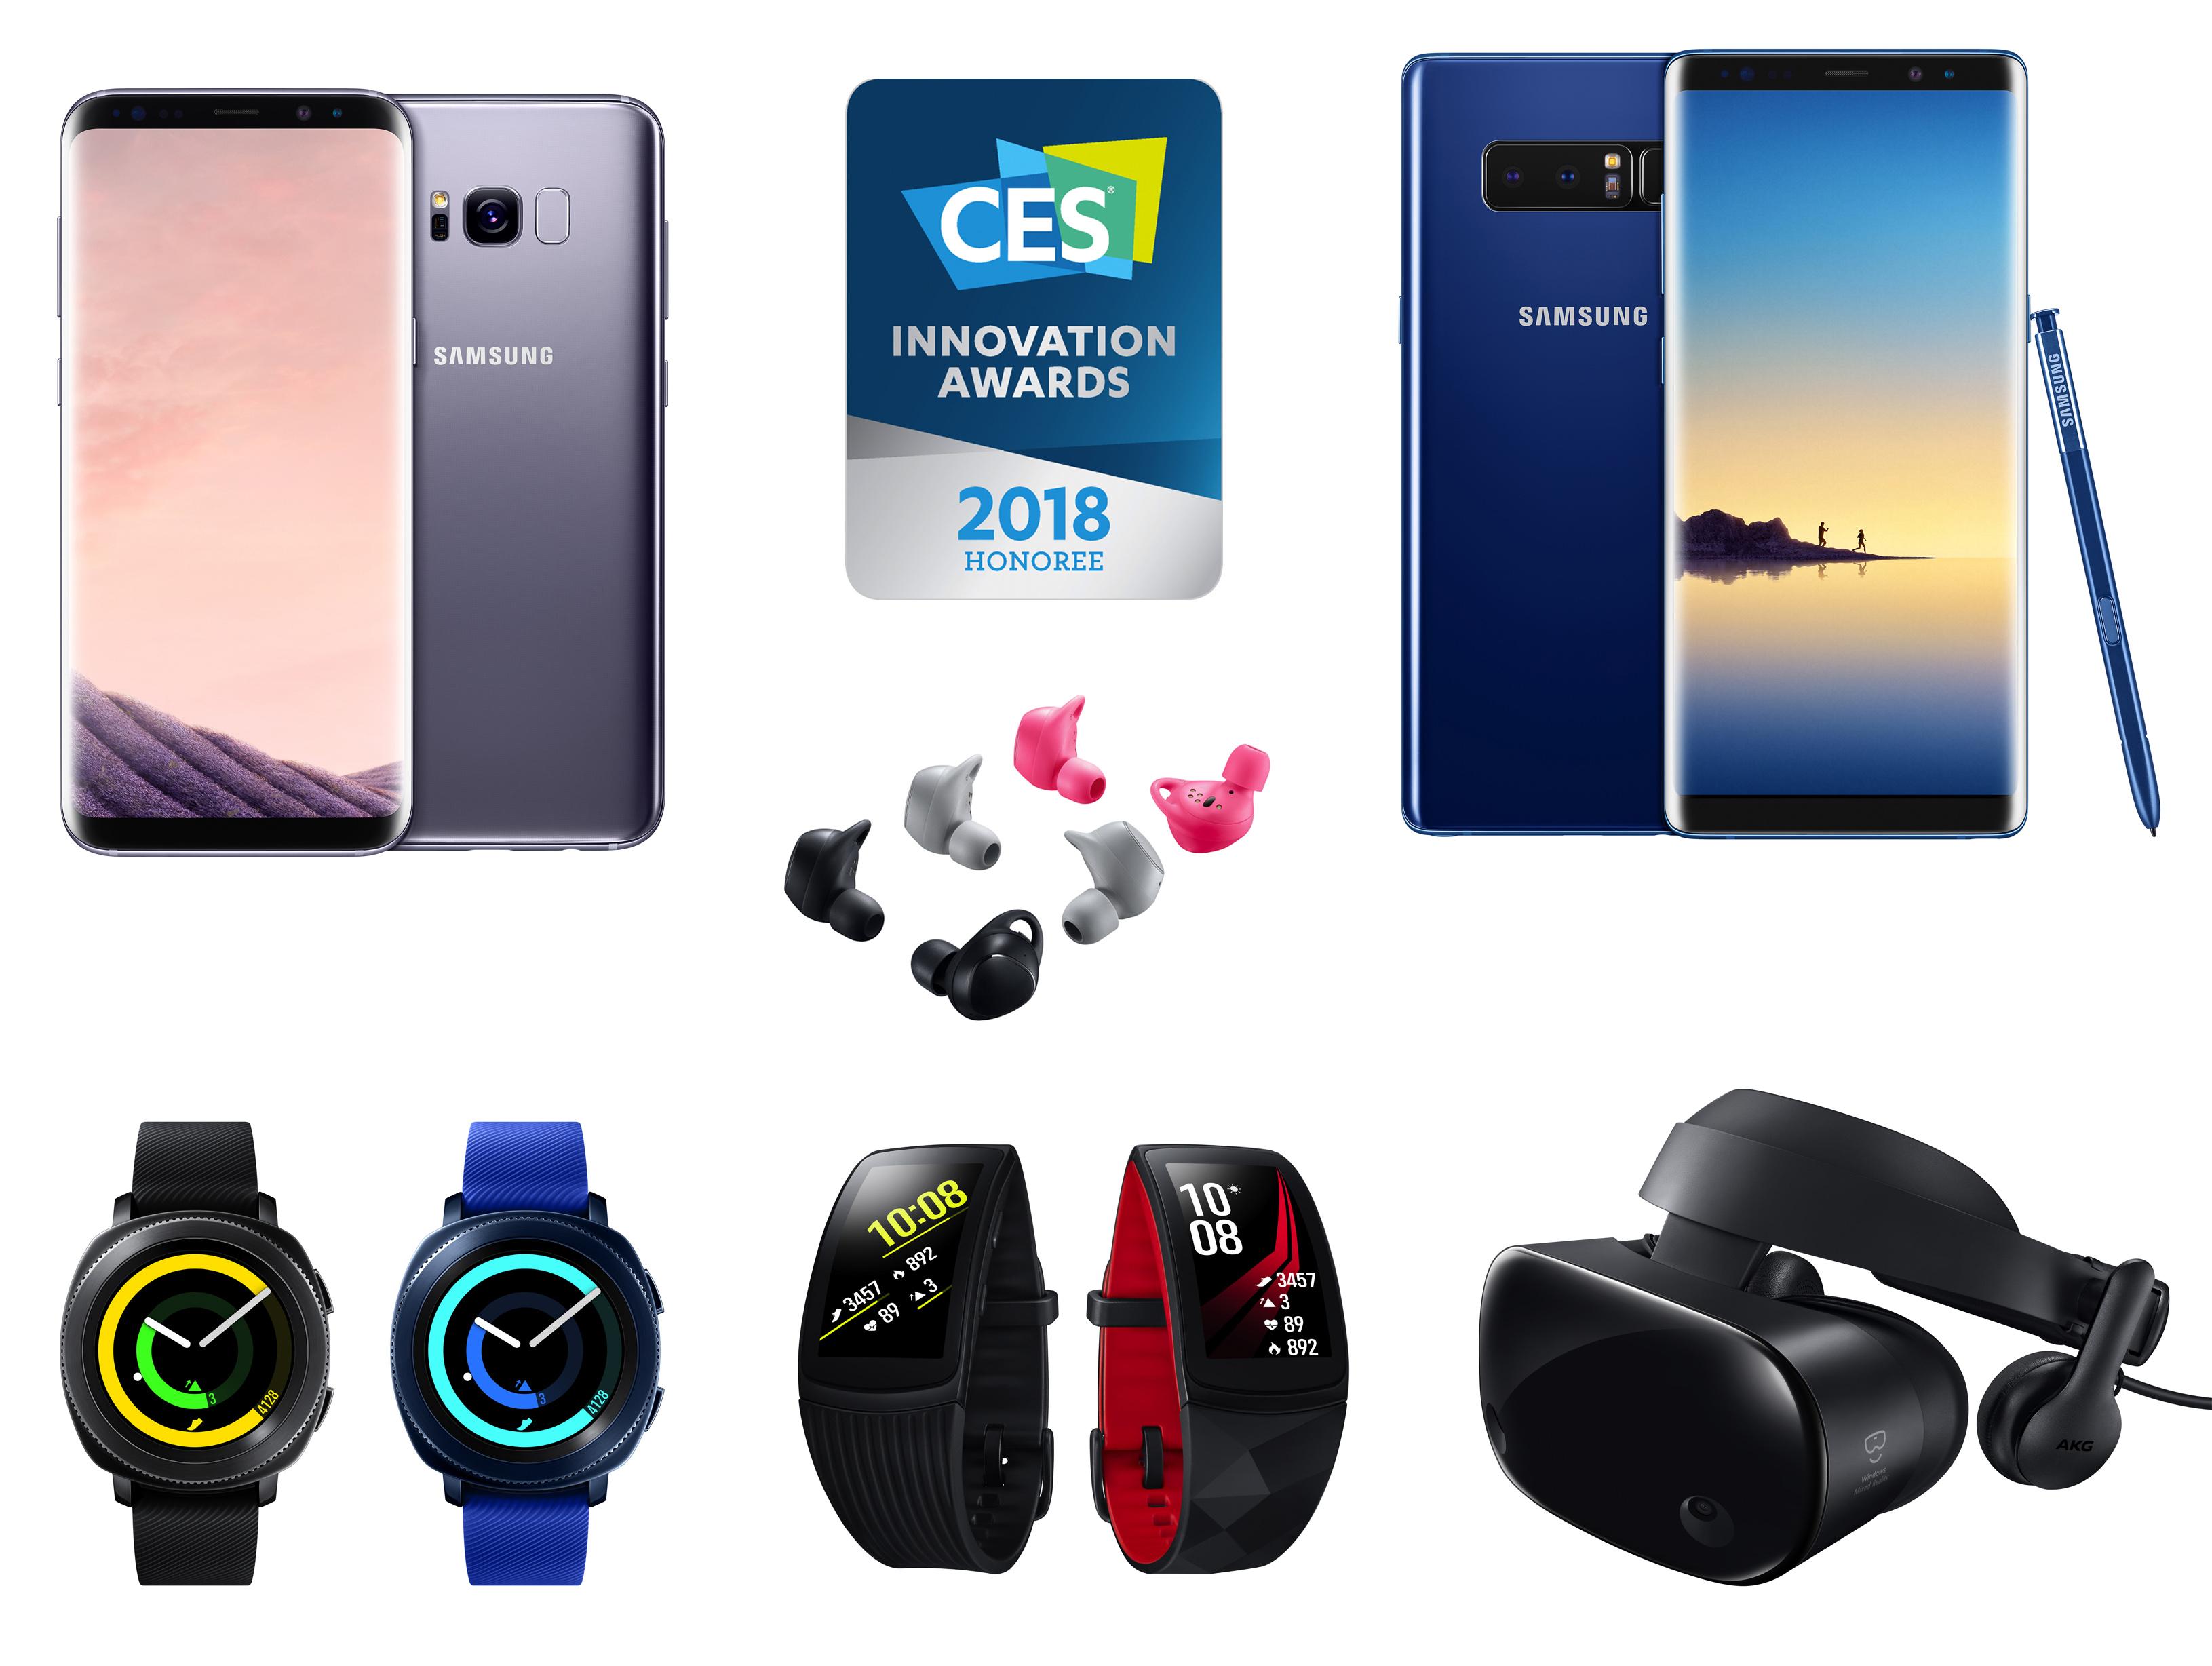 CES 혁신상 수상한 삼성전자 제품들